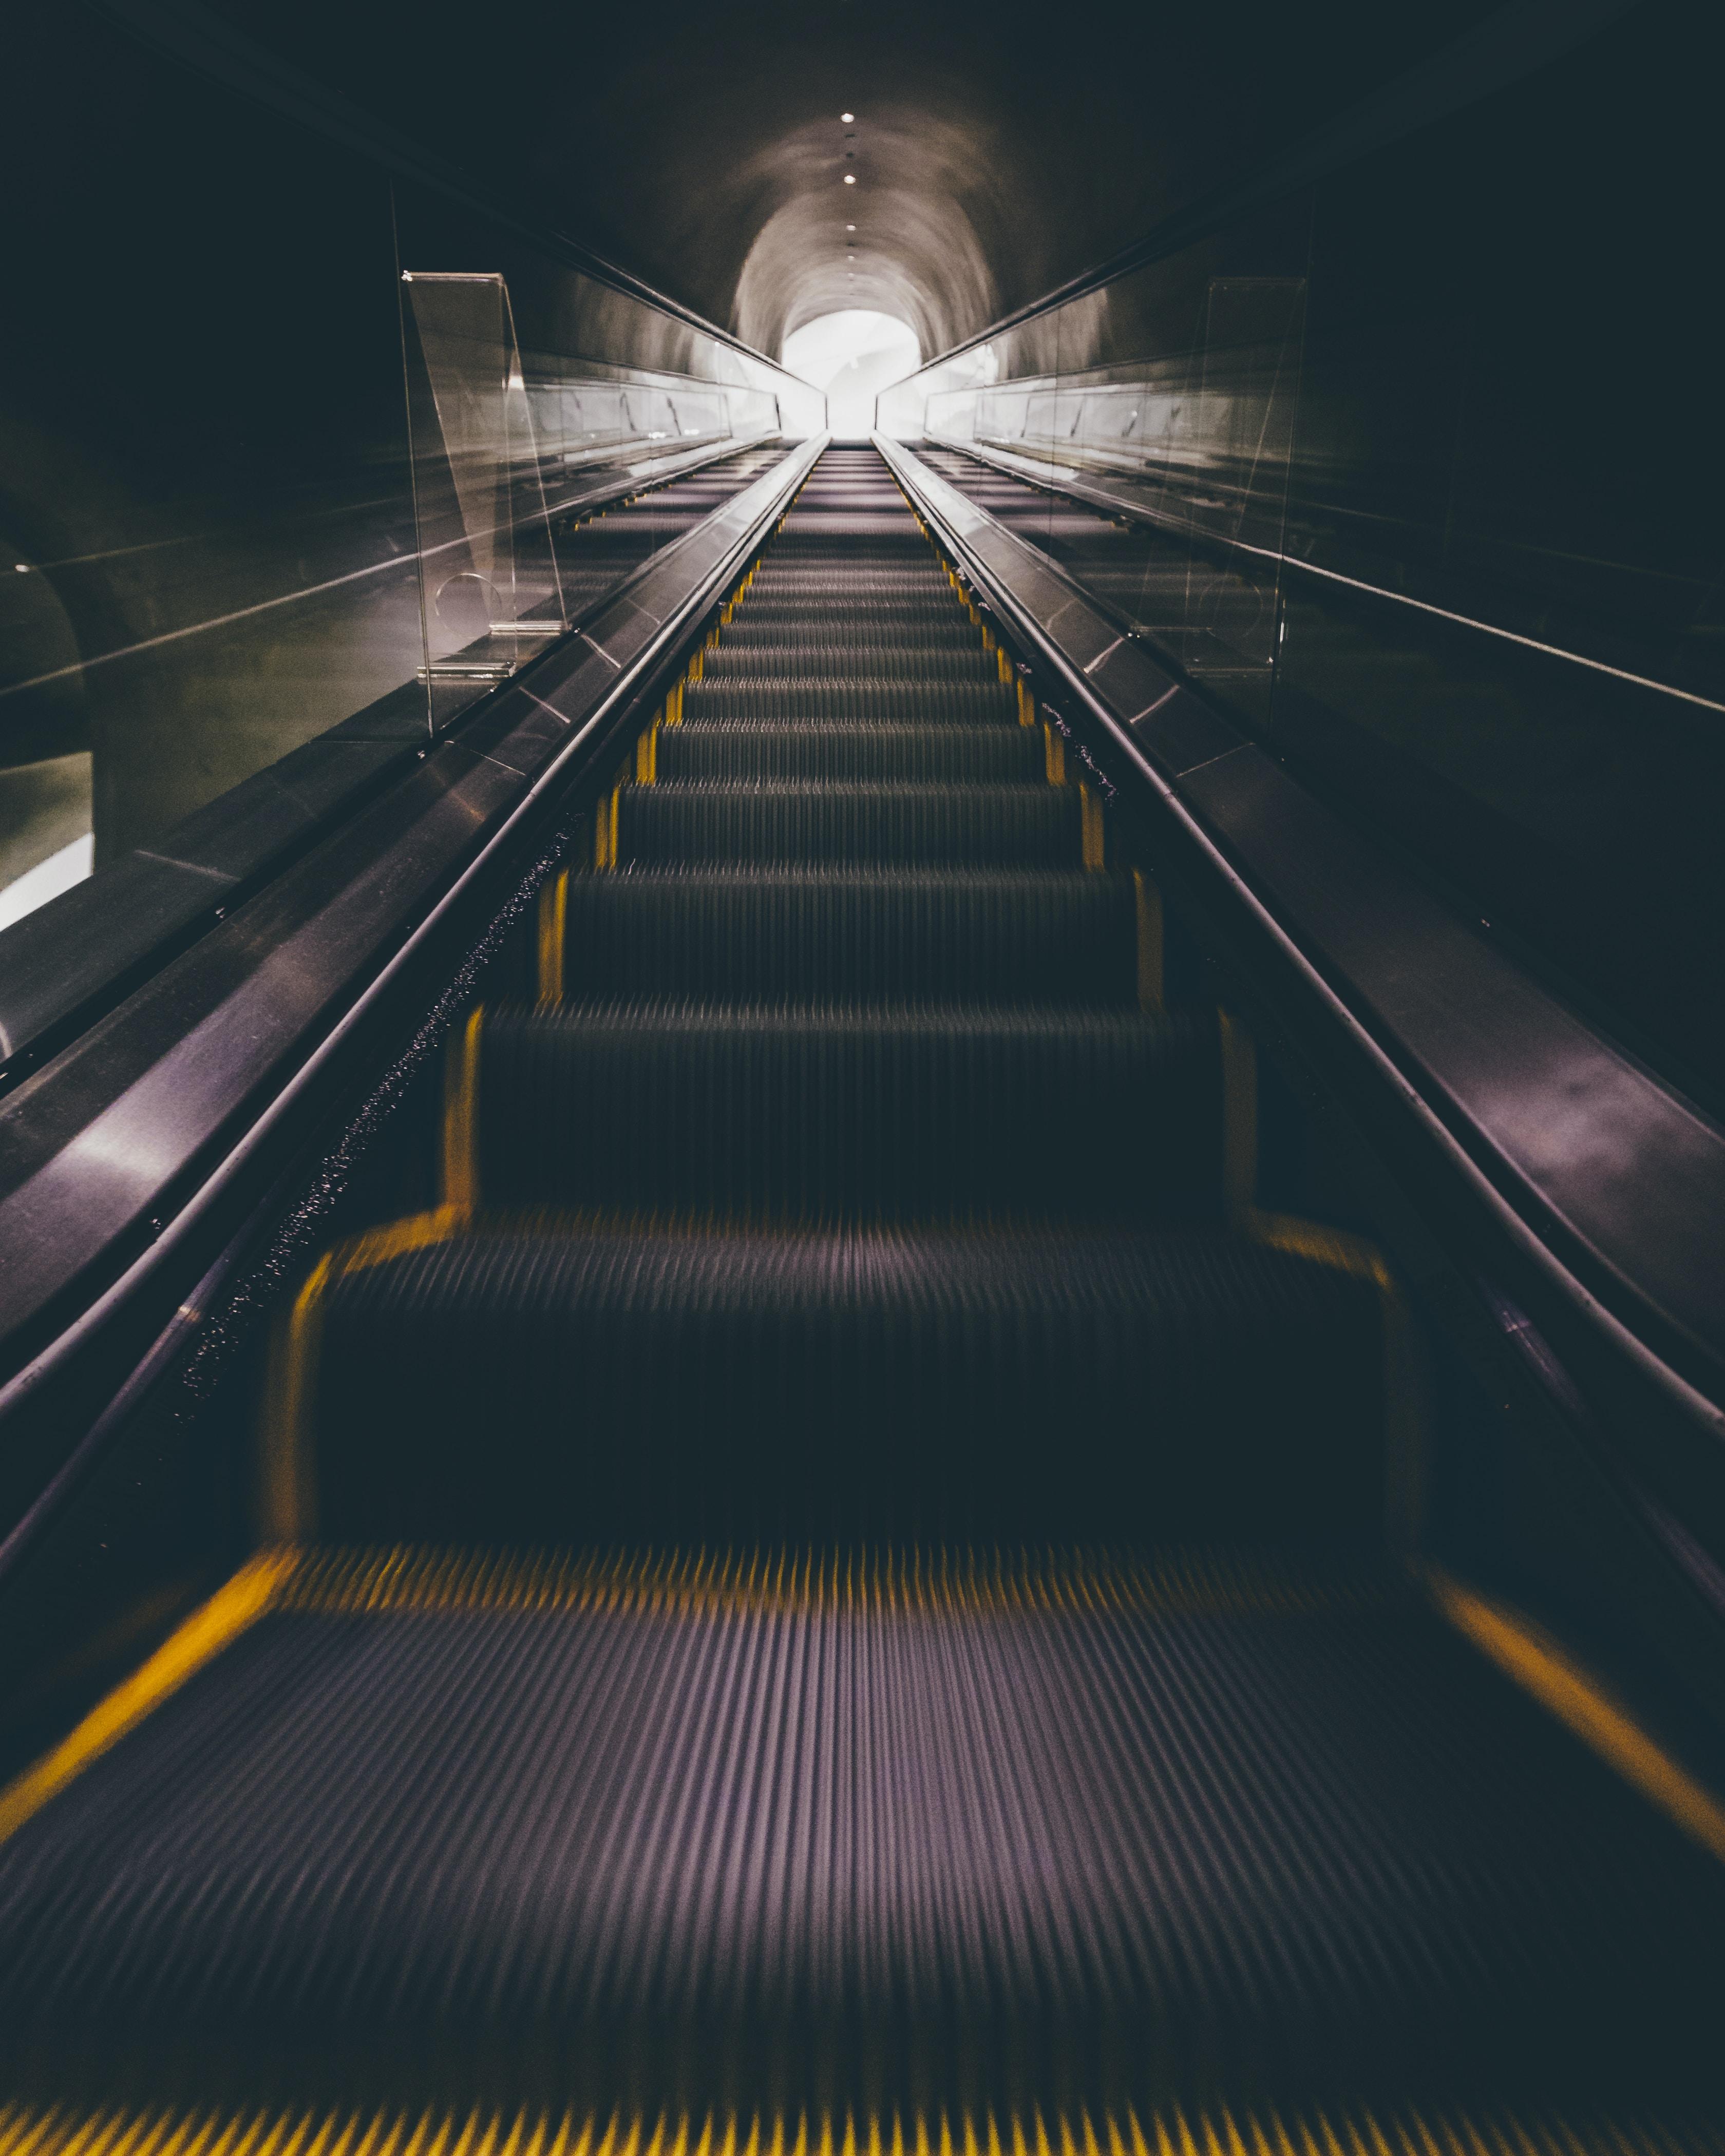 escalator moving upward